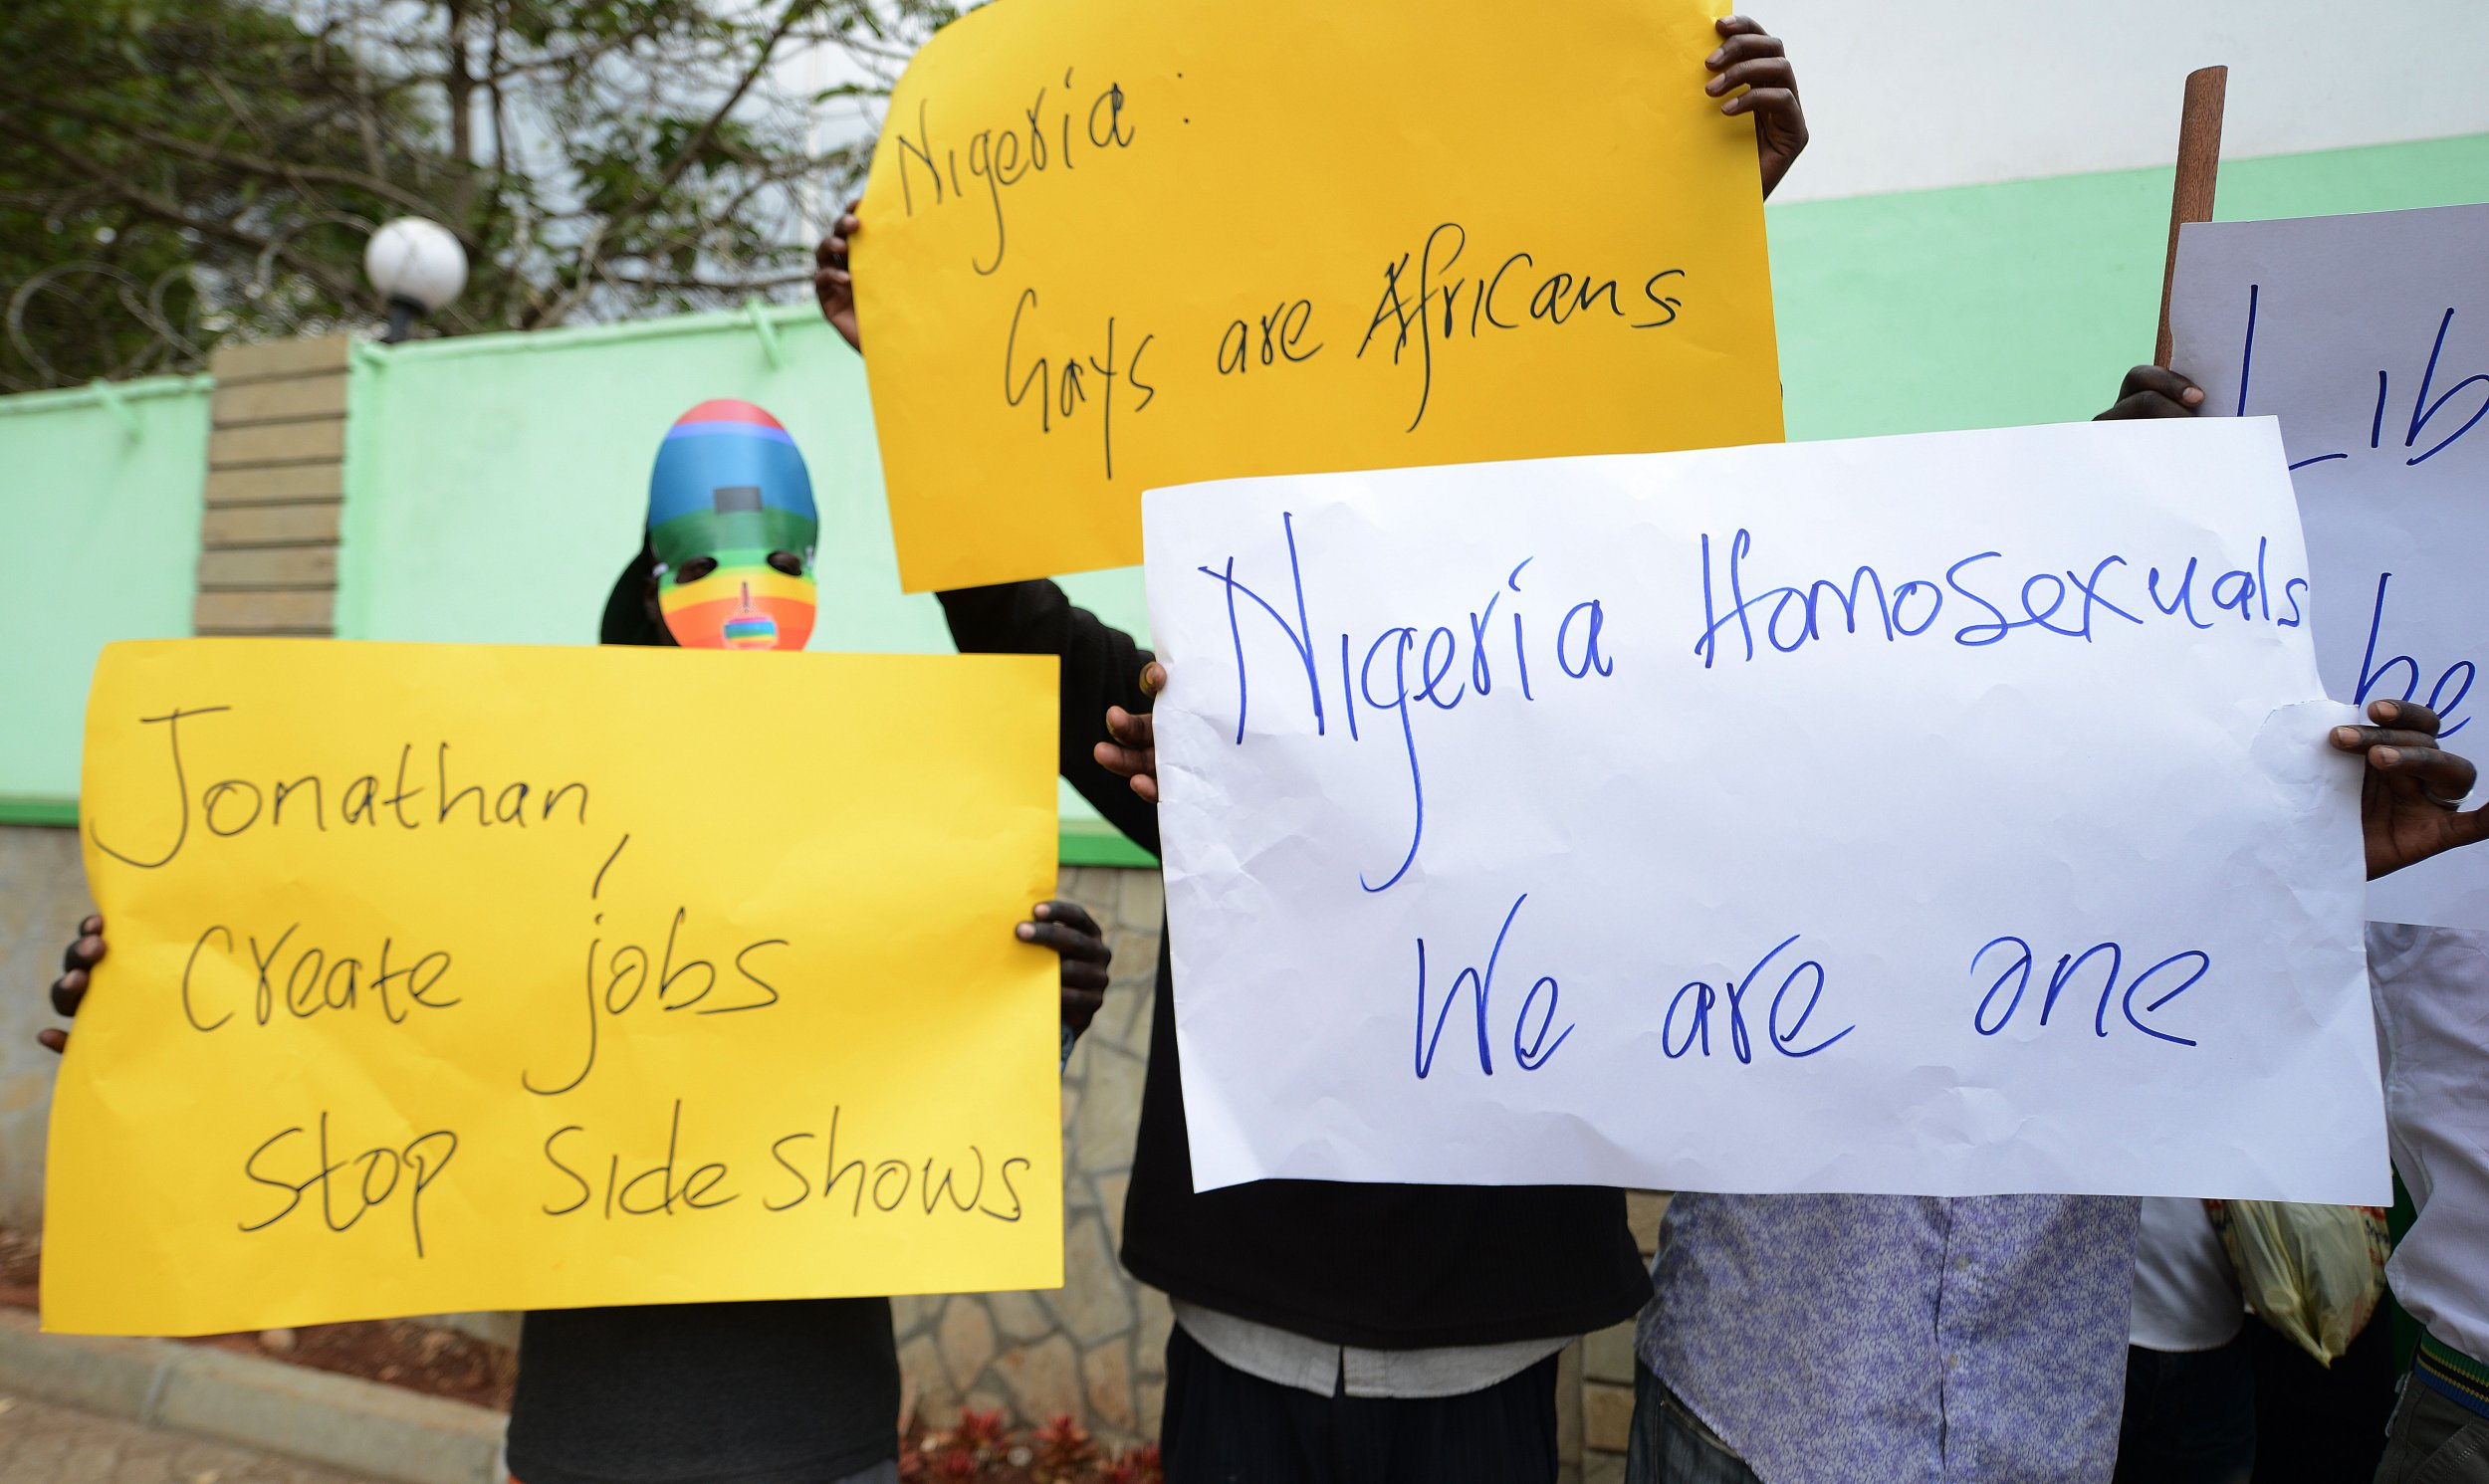 https://d.newsweek.com/en/full/586744/kenya-lgbt-protest-nigerian-high-commission.jpg